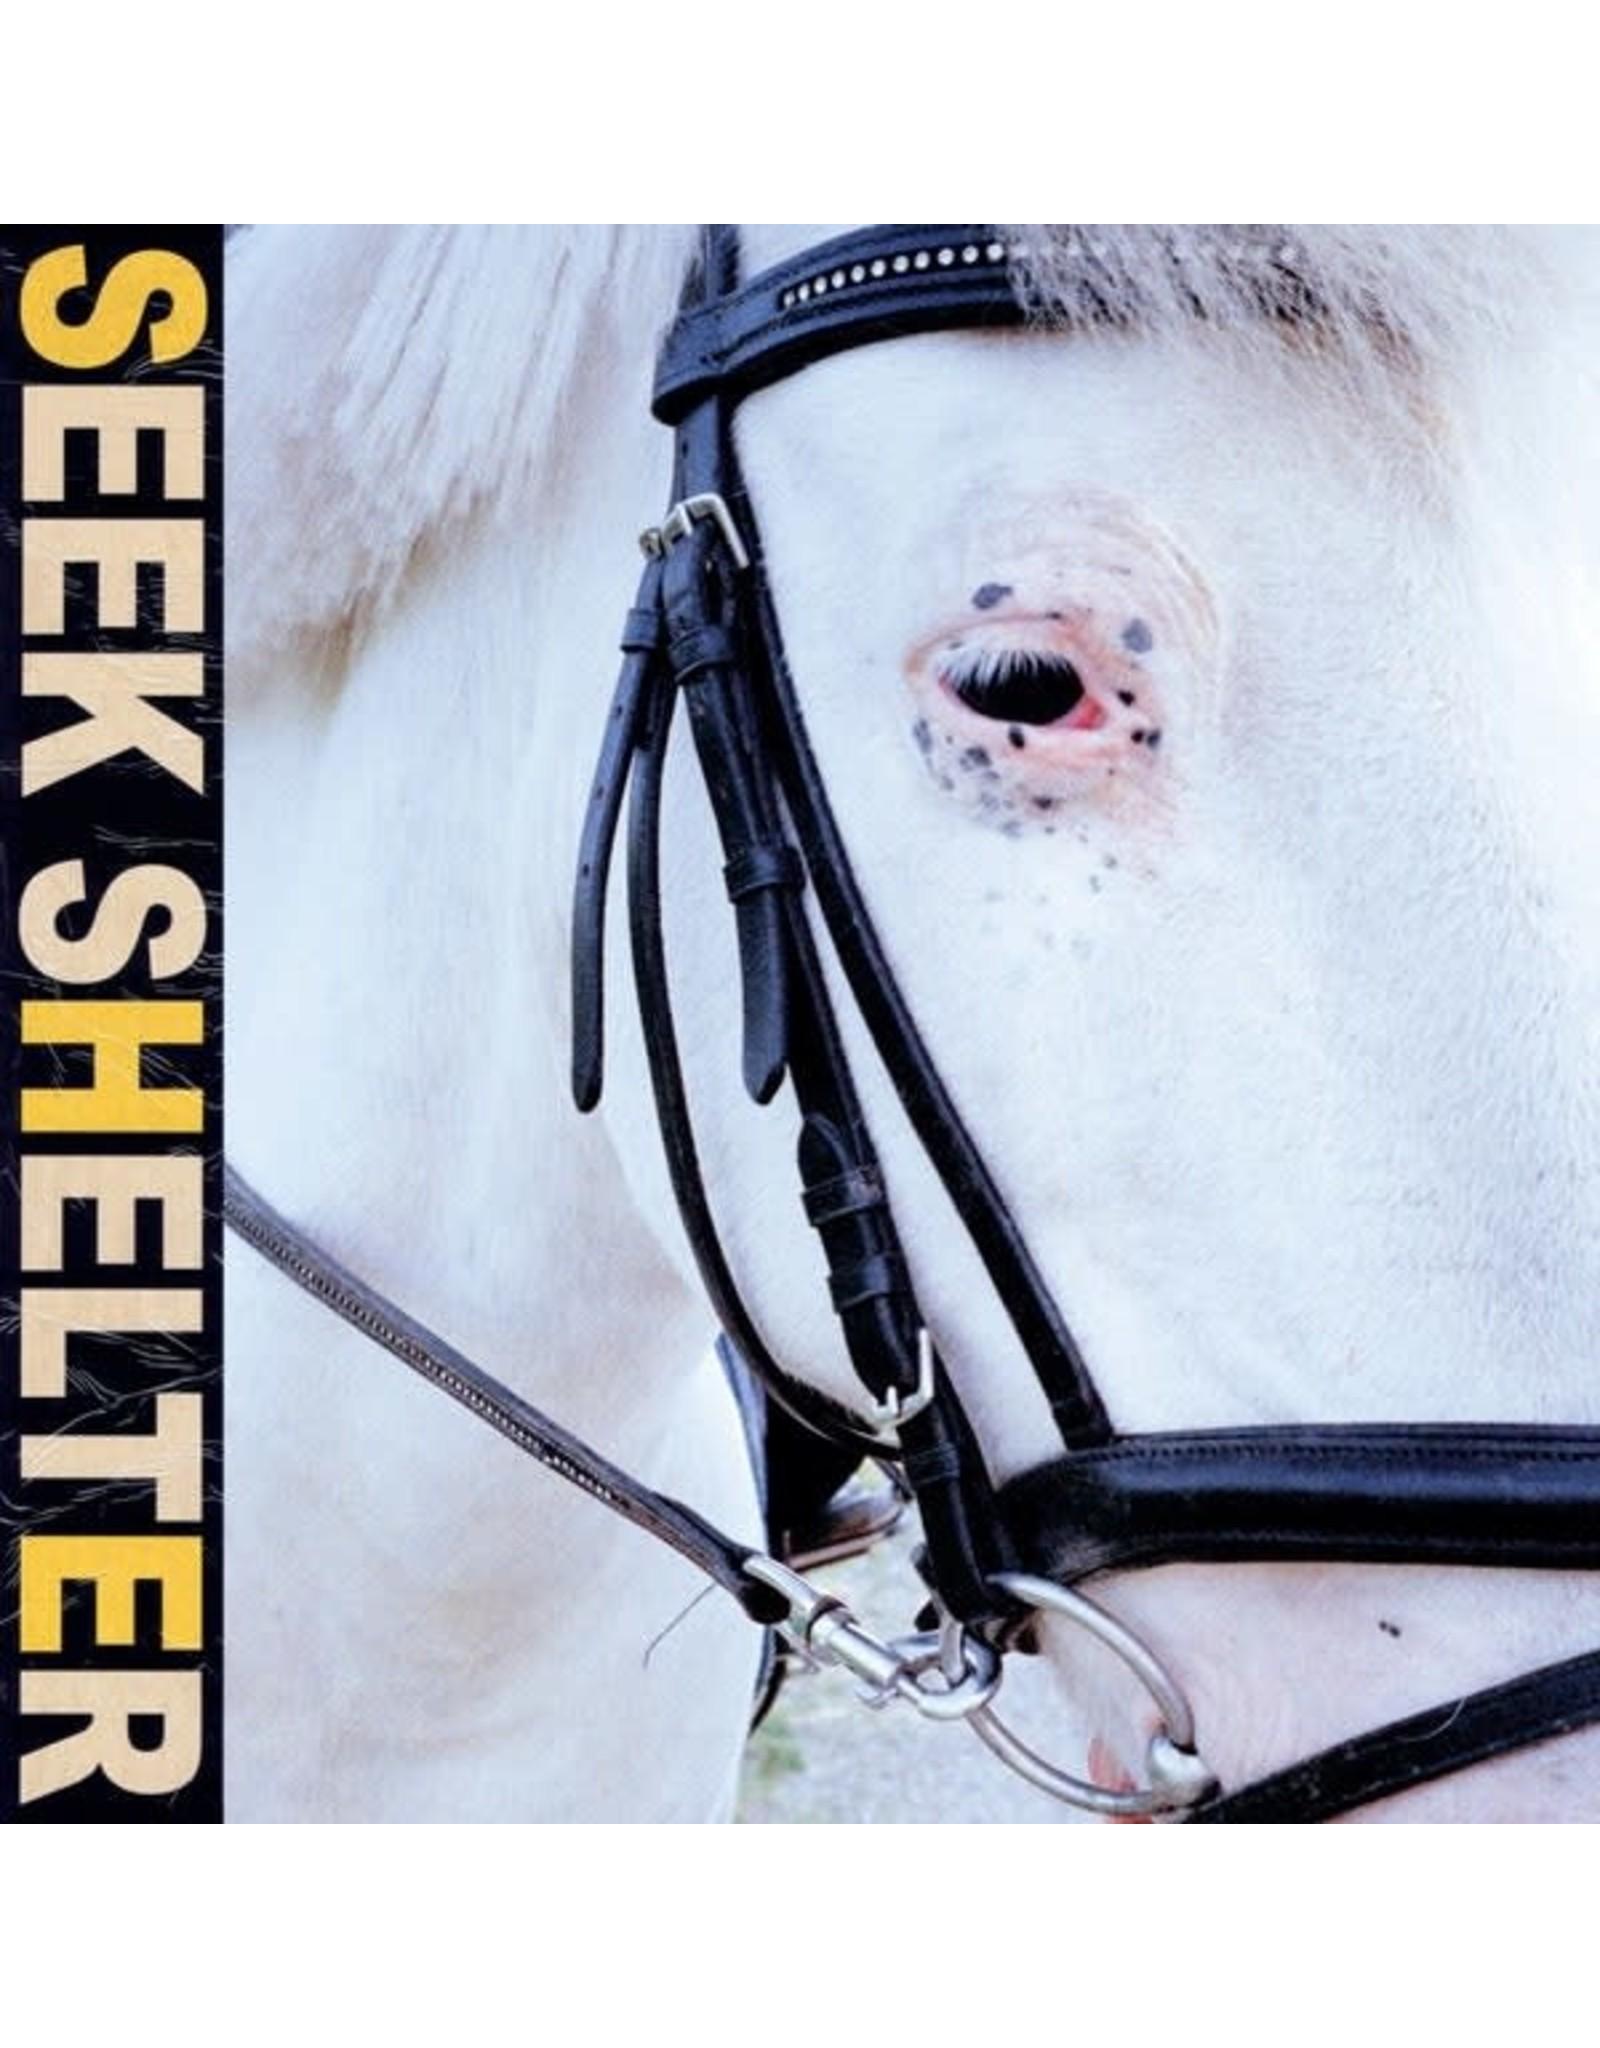 Iceage - Seek Shelter CD